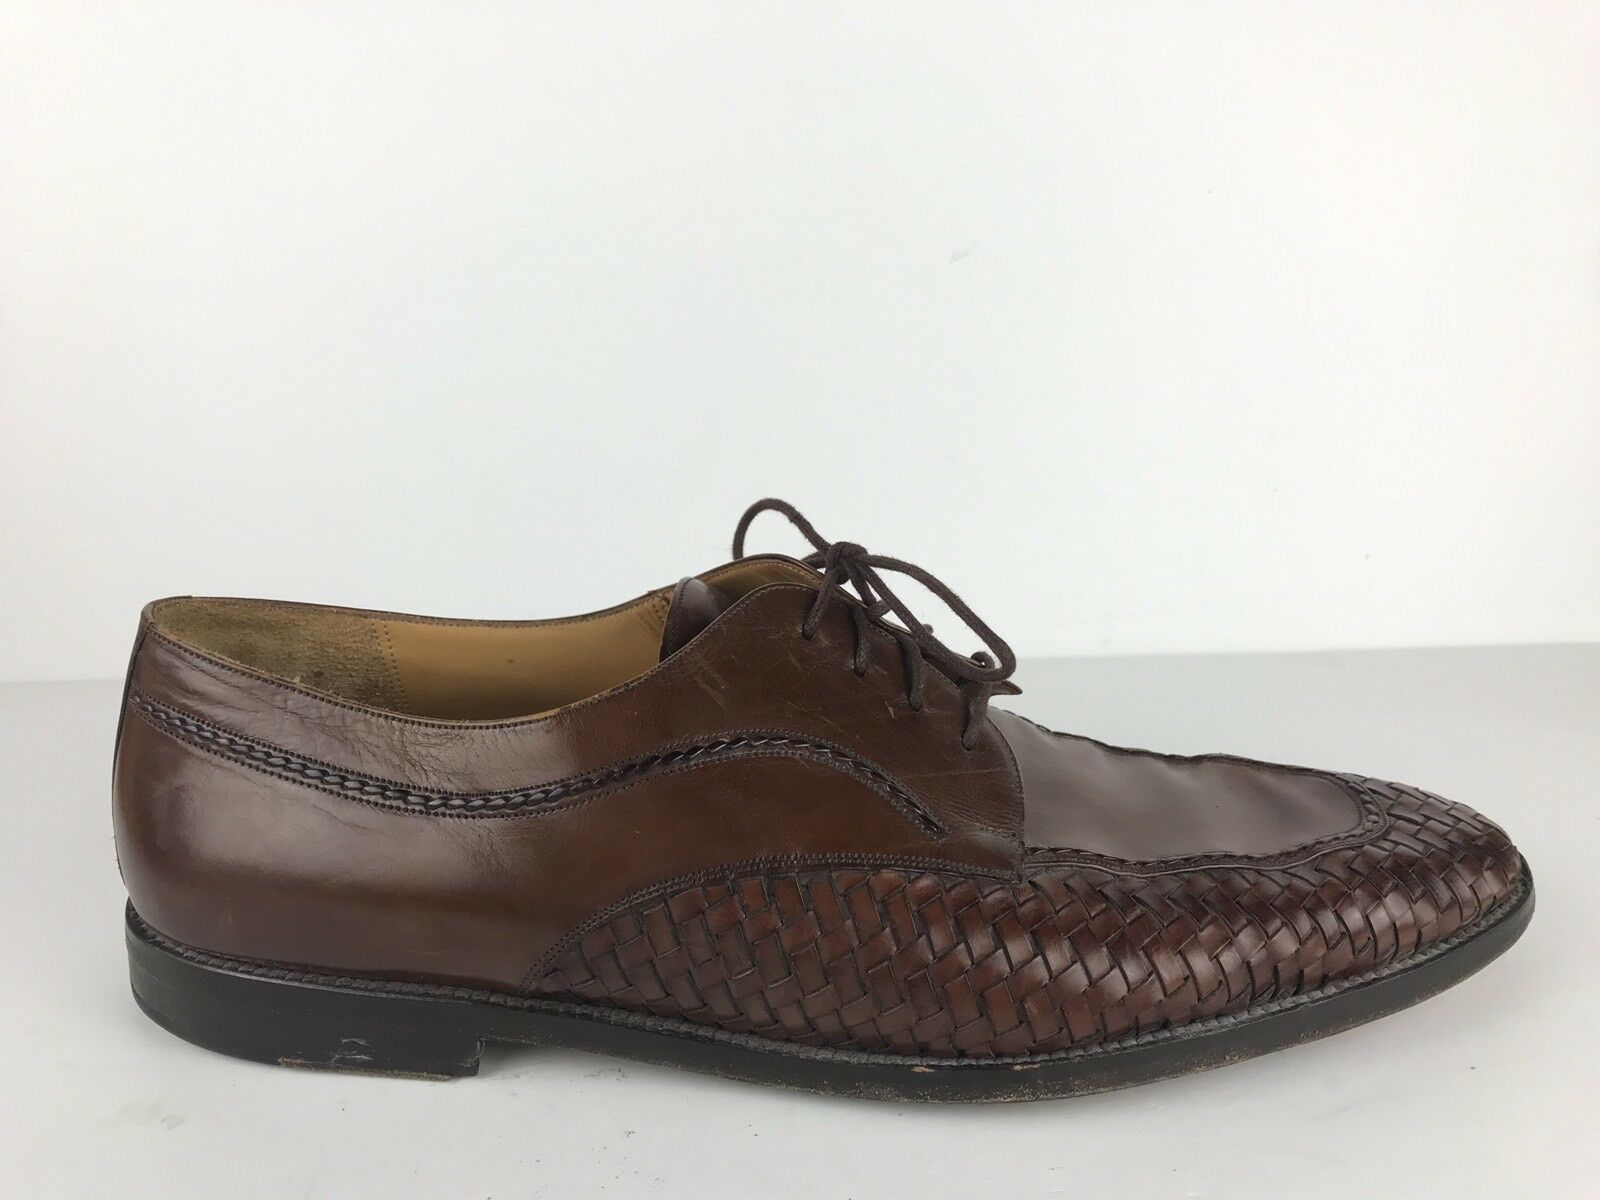 Men's Sz 15 Mezlan Bogota Brown Leather Derby Dress shoes Woven Made in Spain